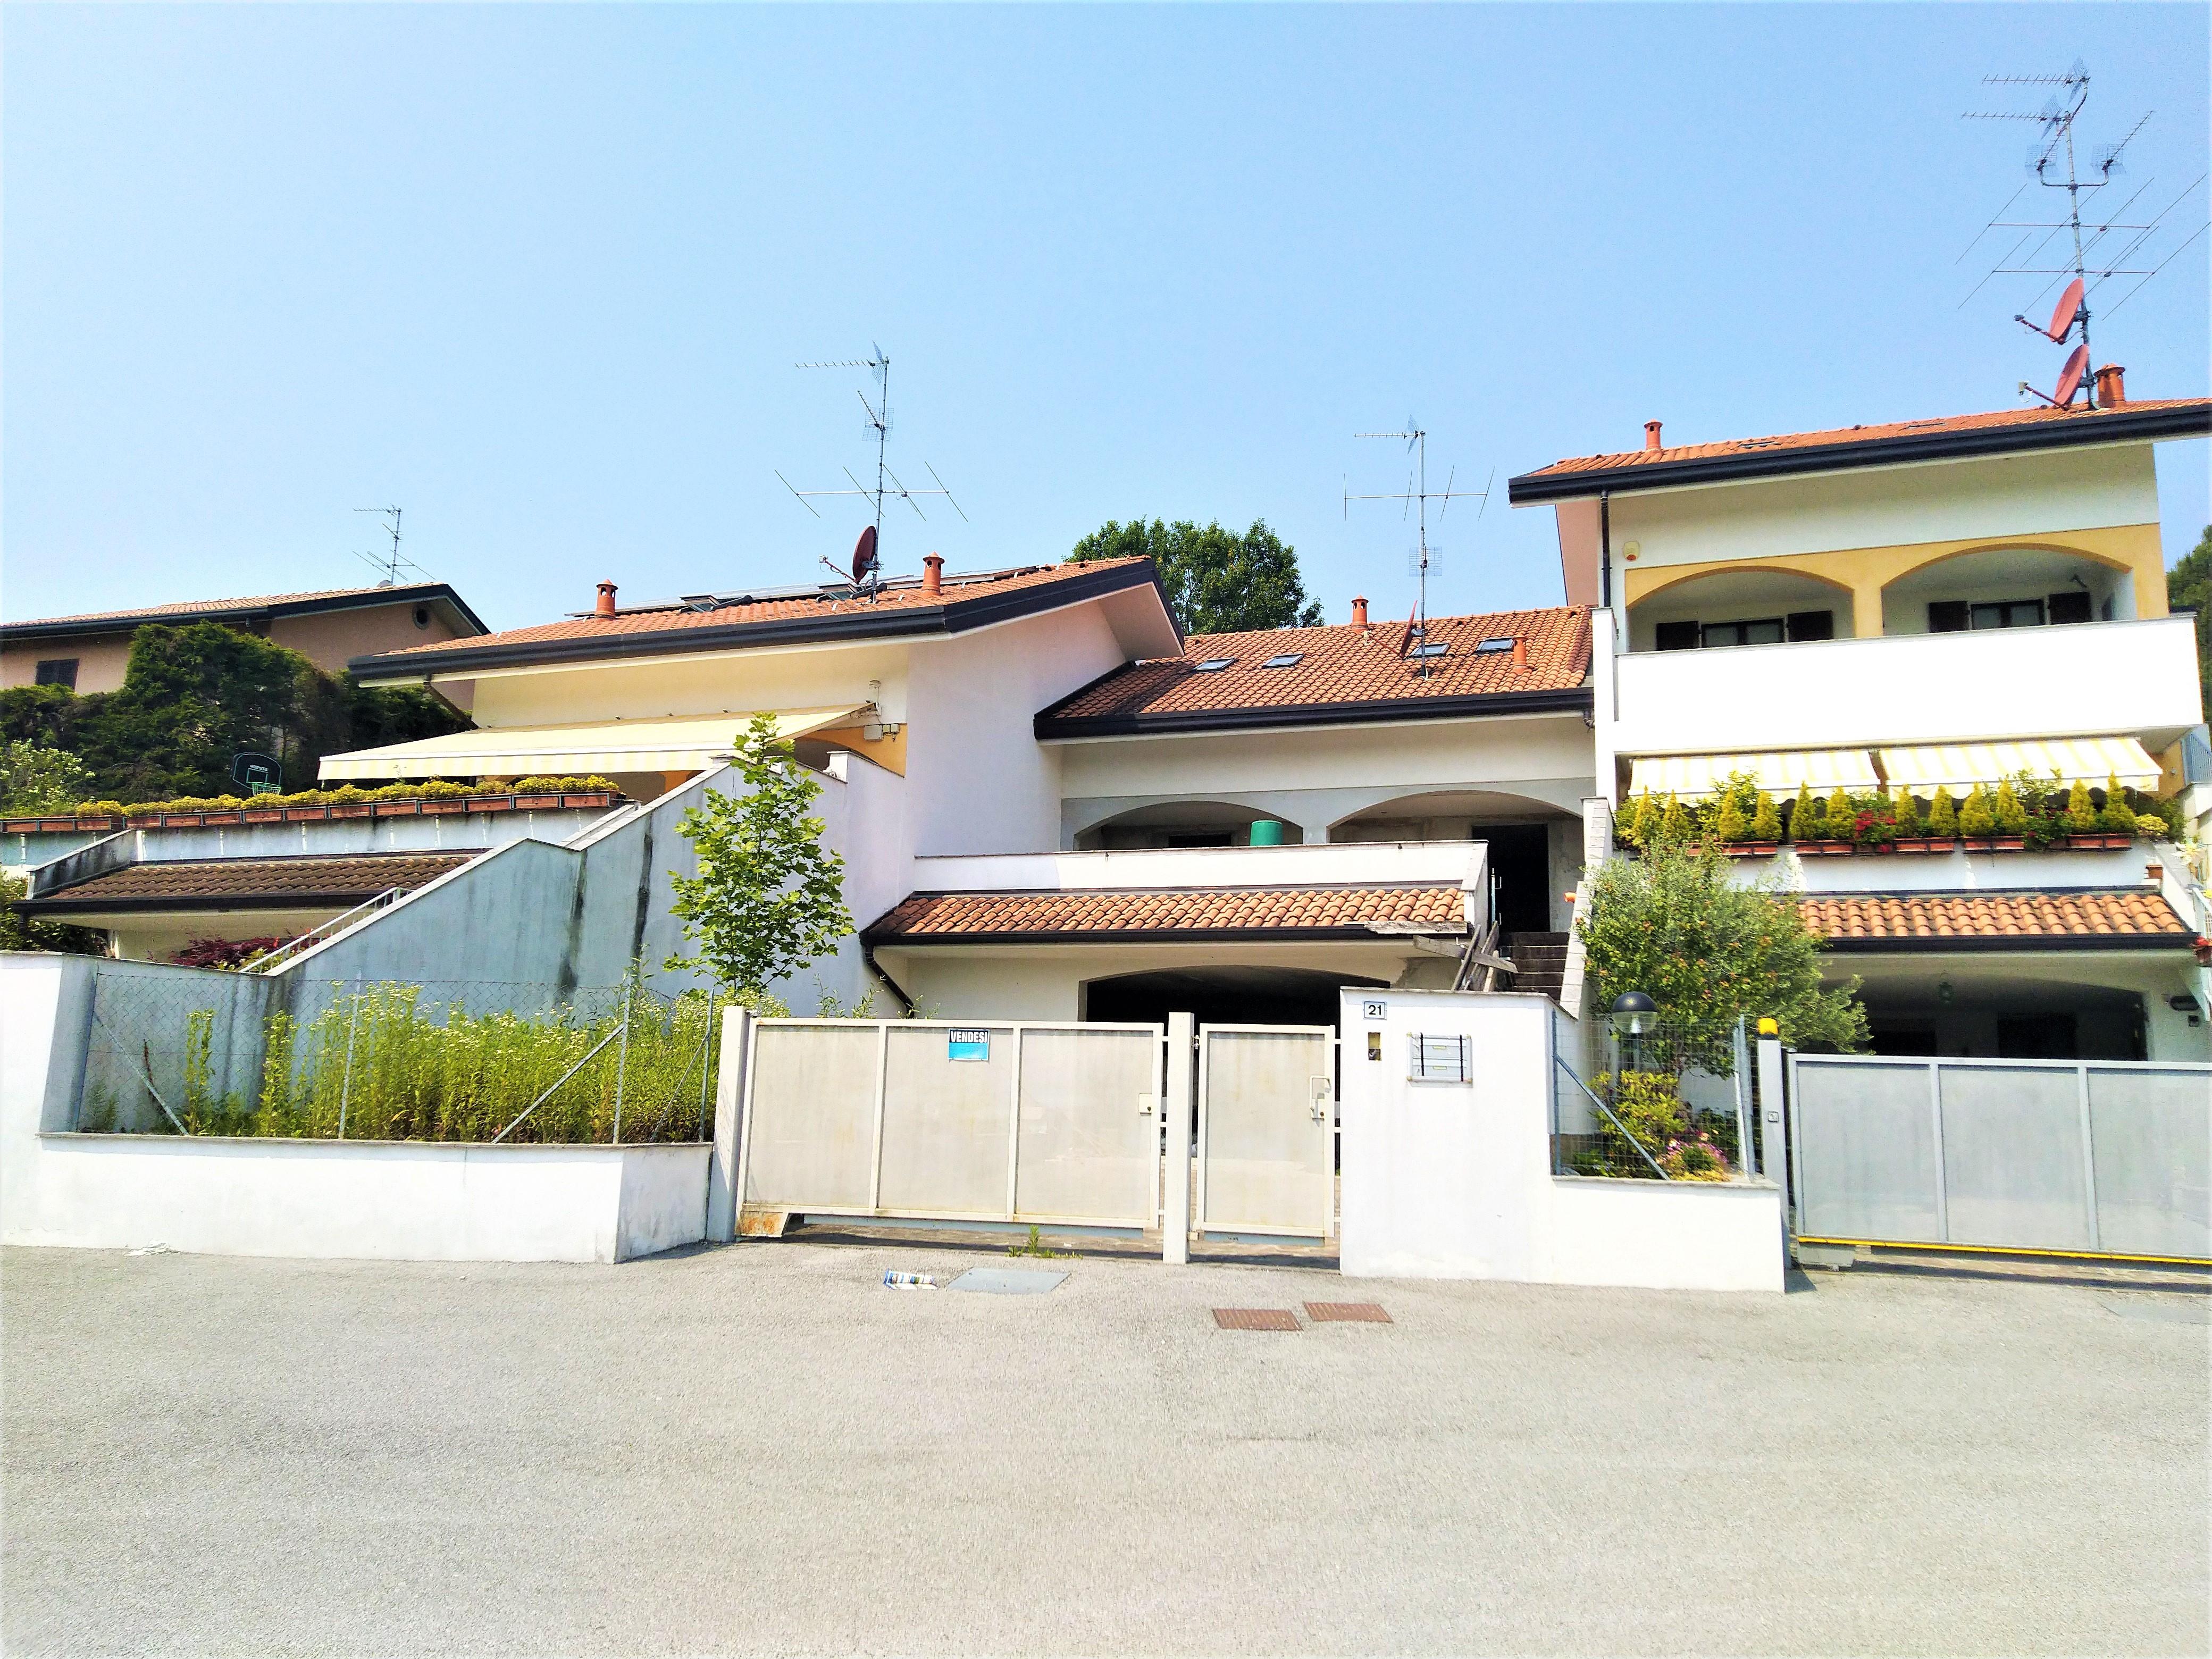 Lurago d' Erba : Villa a schiera a rustico a Euro 220.000